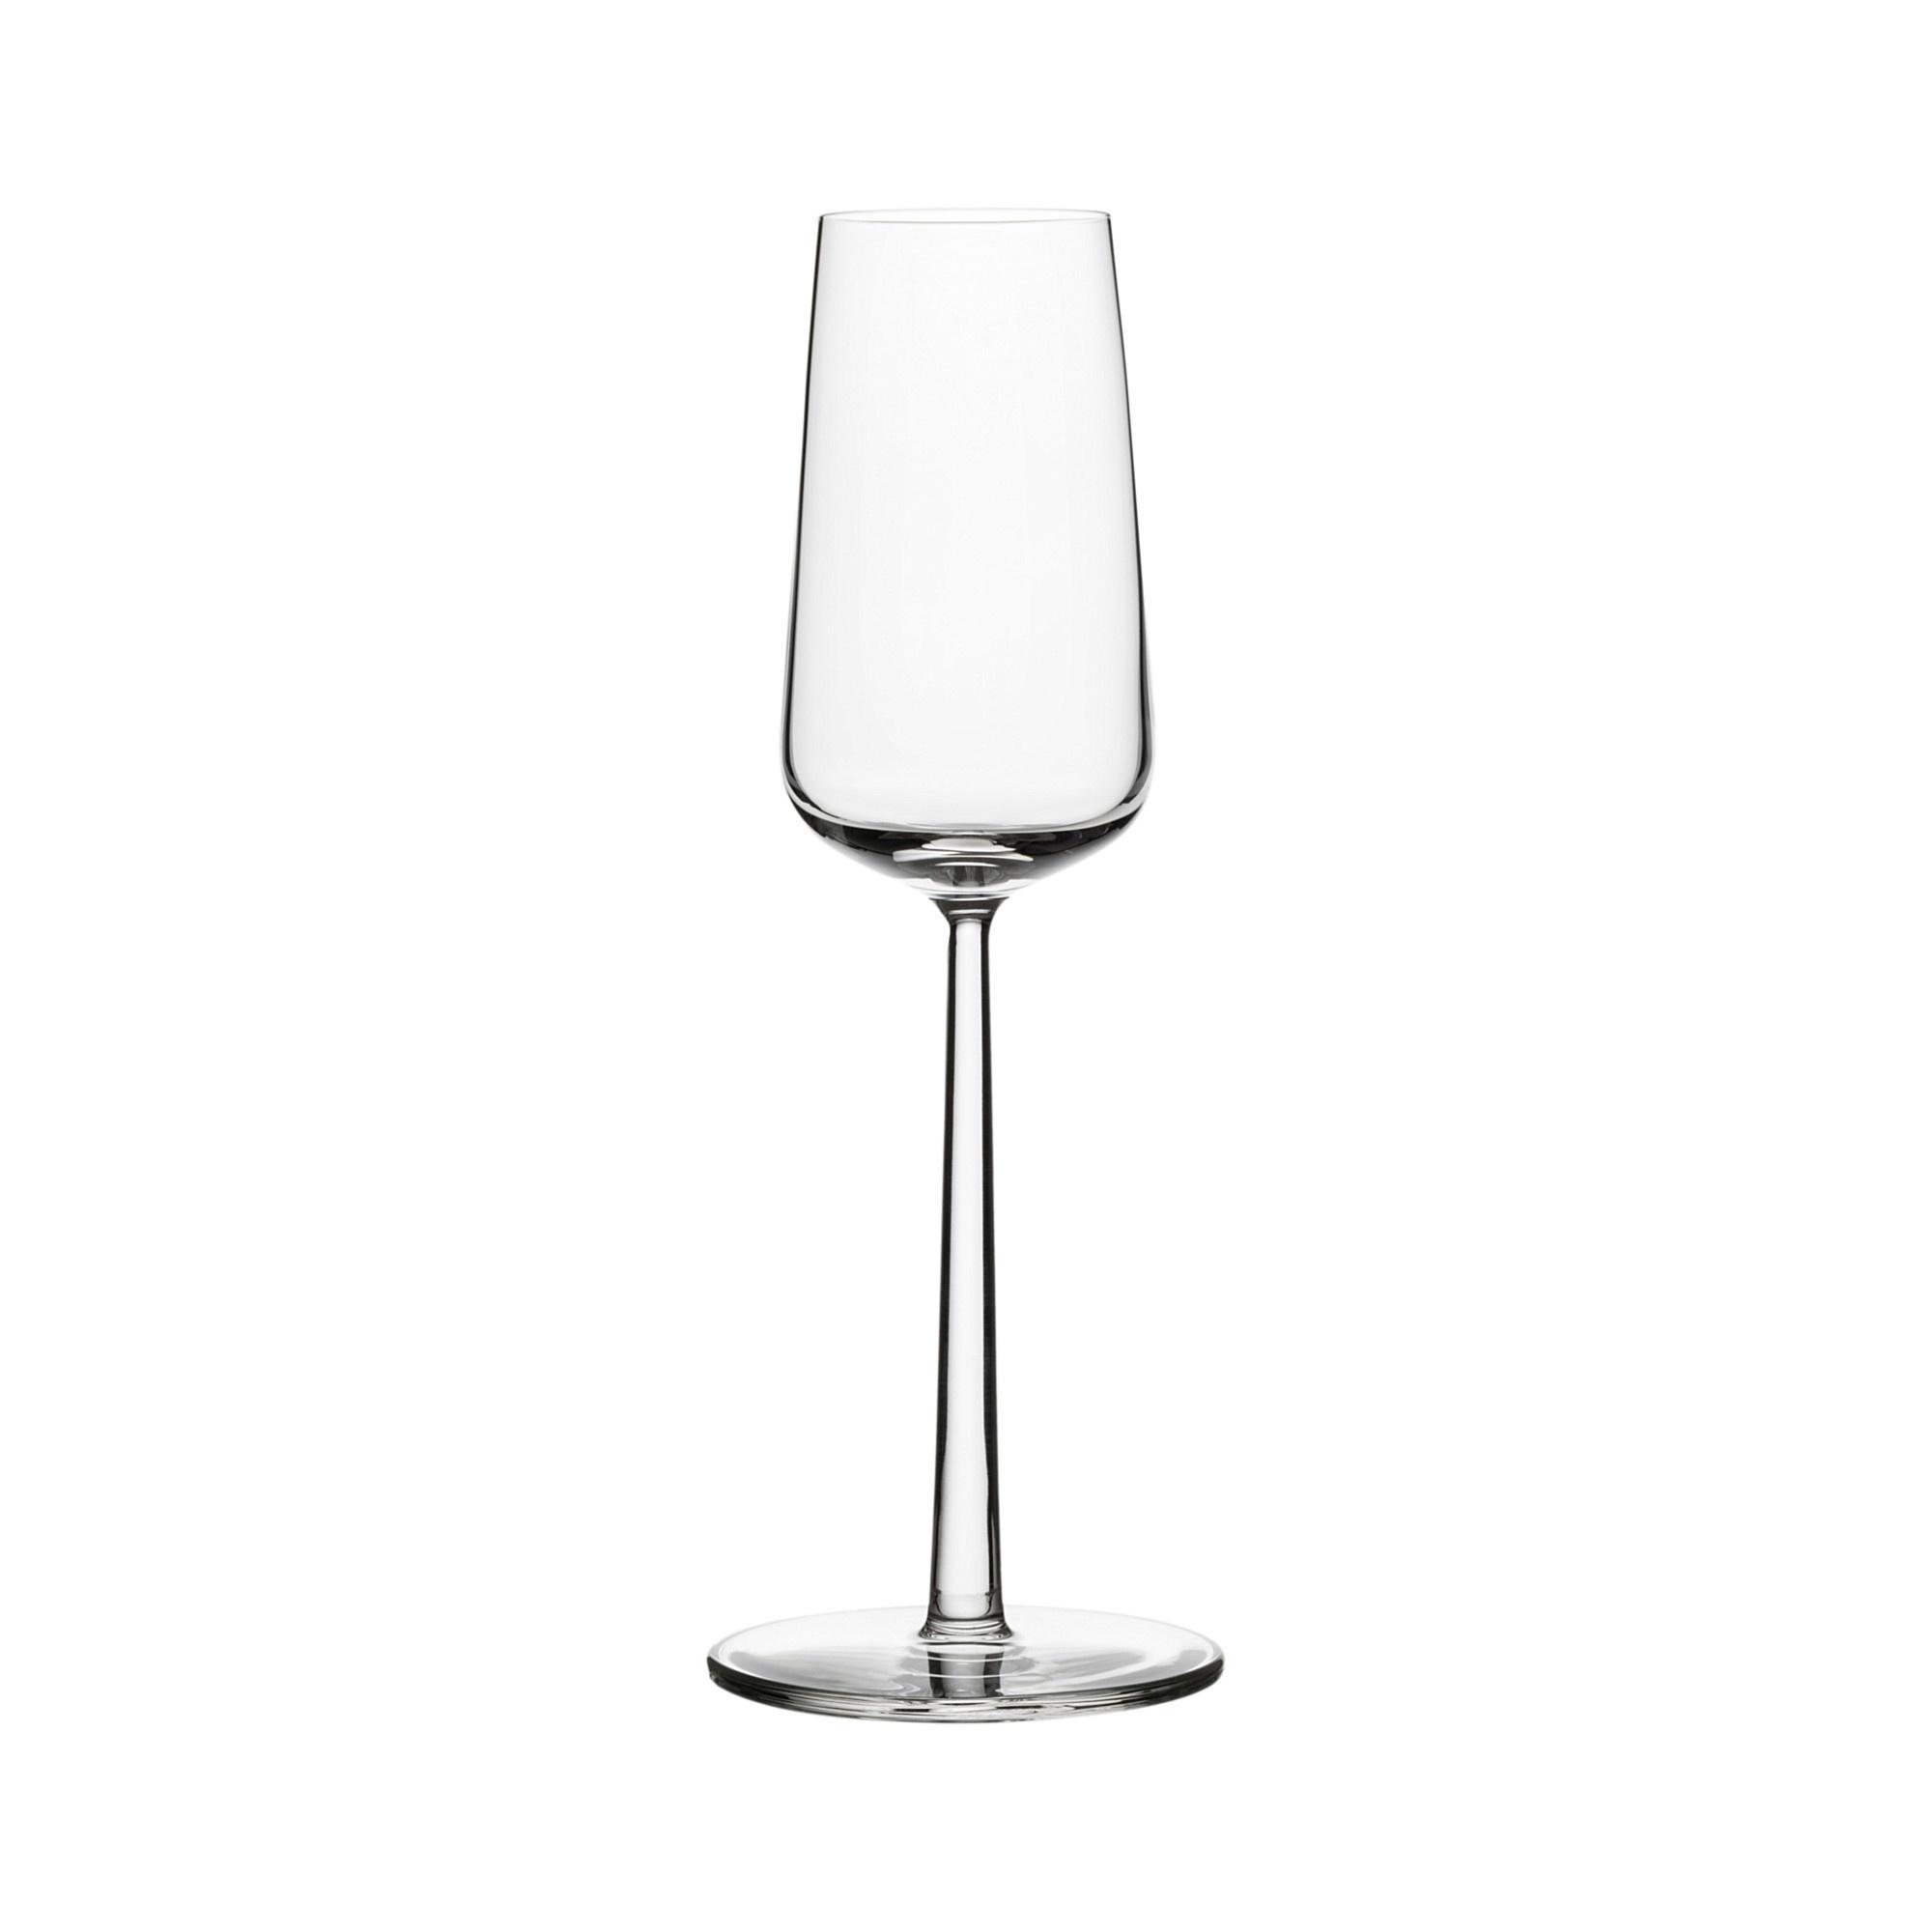 Iittala Iittala Essence Champagneglas - 21 cl - Helder - 2 stuks